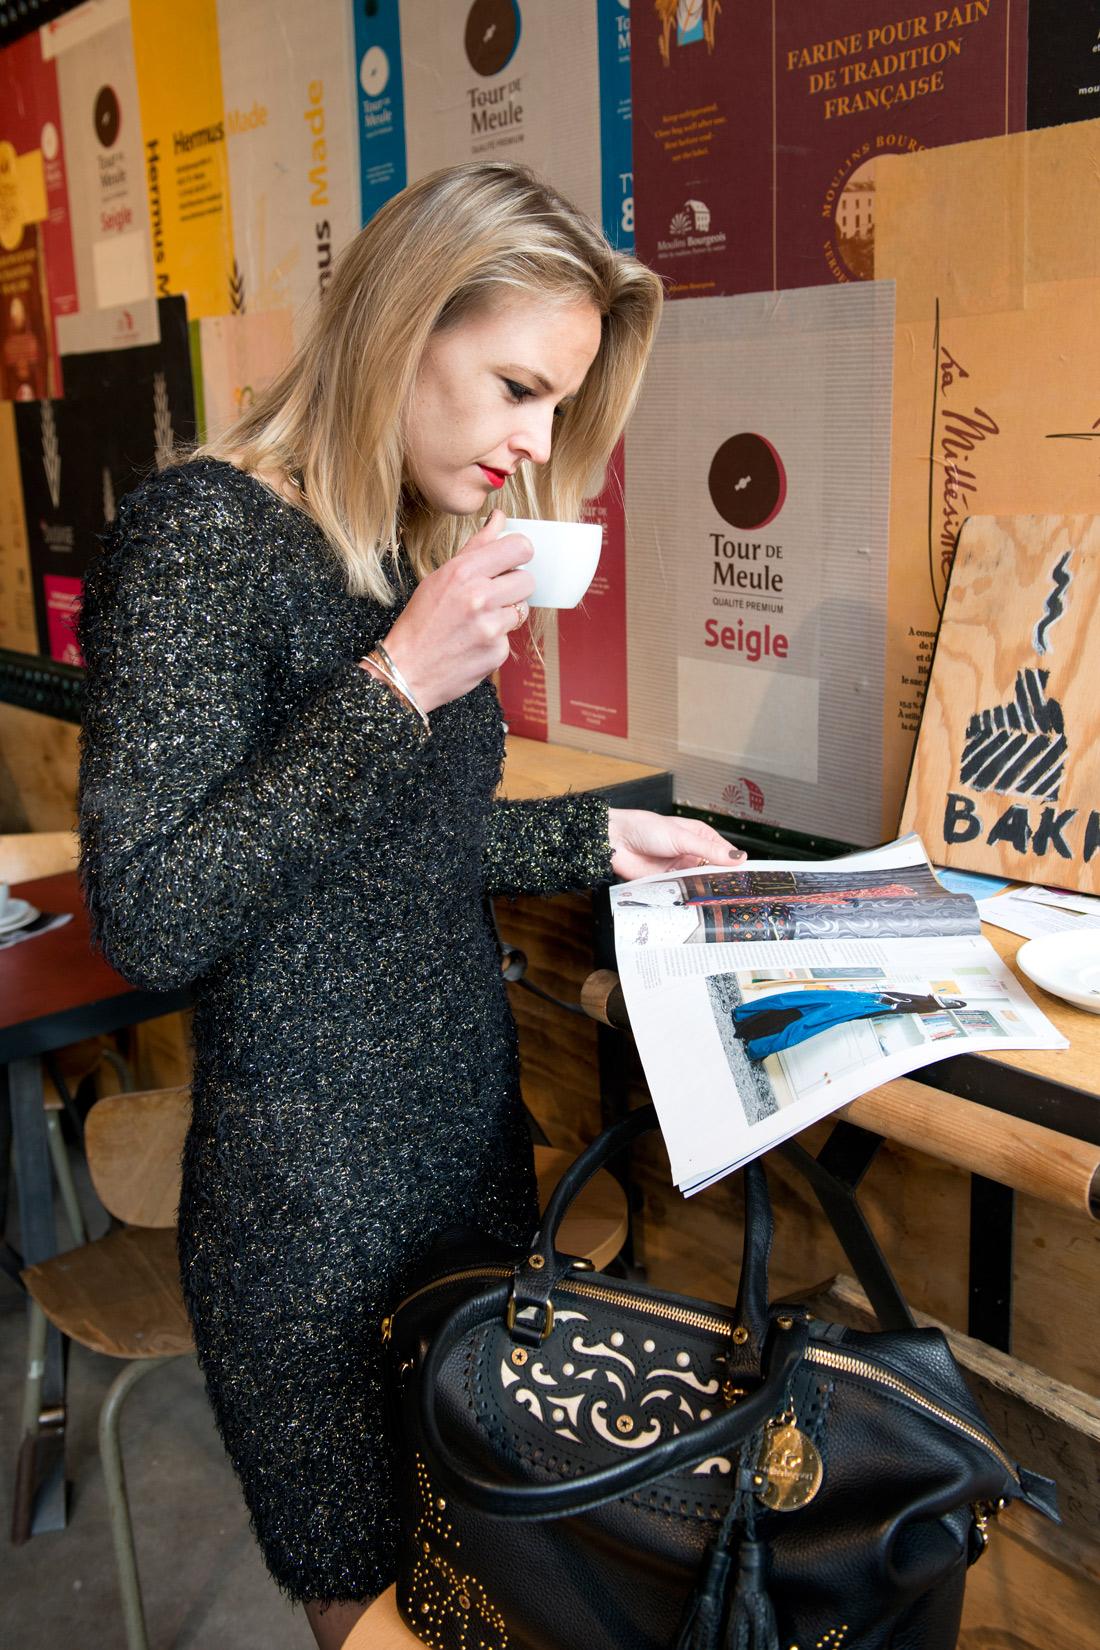 Bag-at-you---Fashion-blog---Leontine-Hagoort-Amazone-Studs-Bag-Black